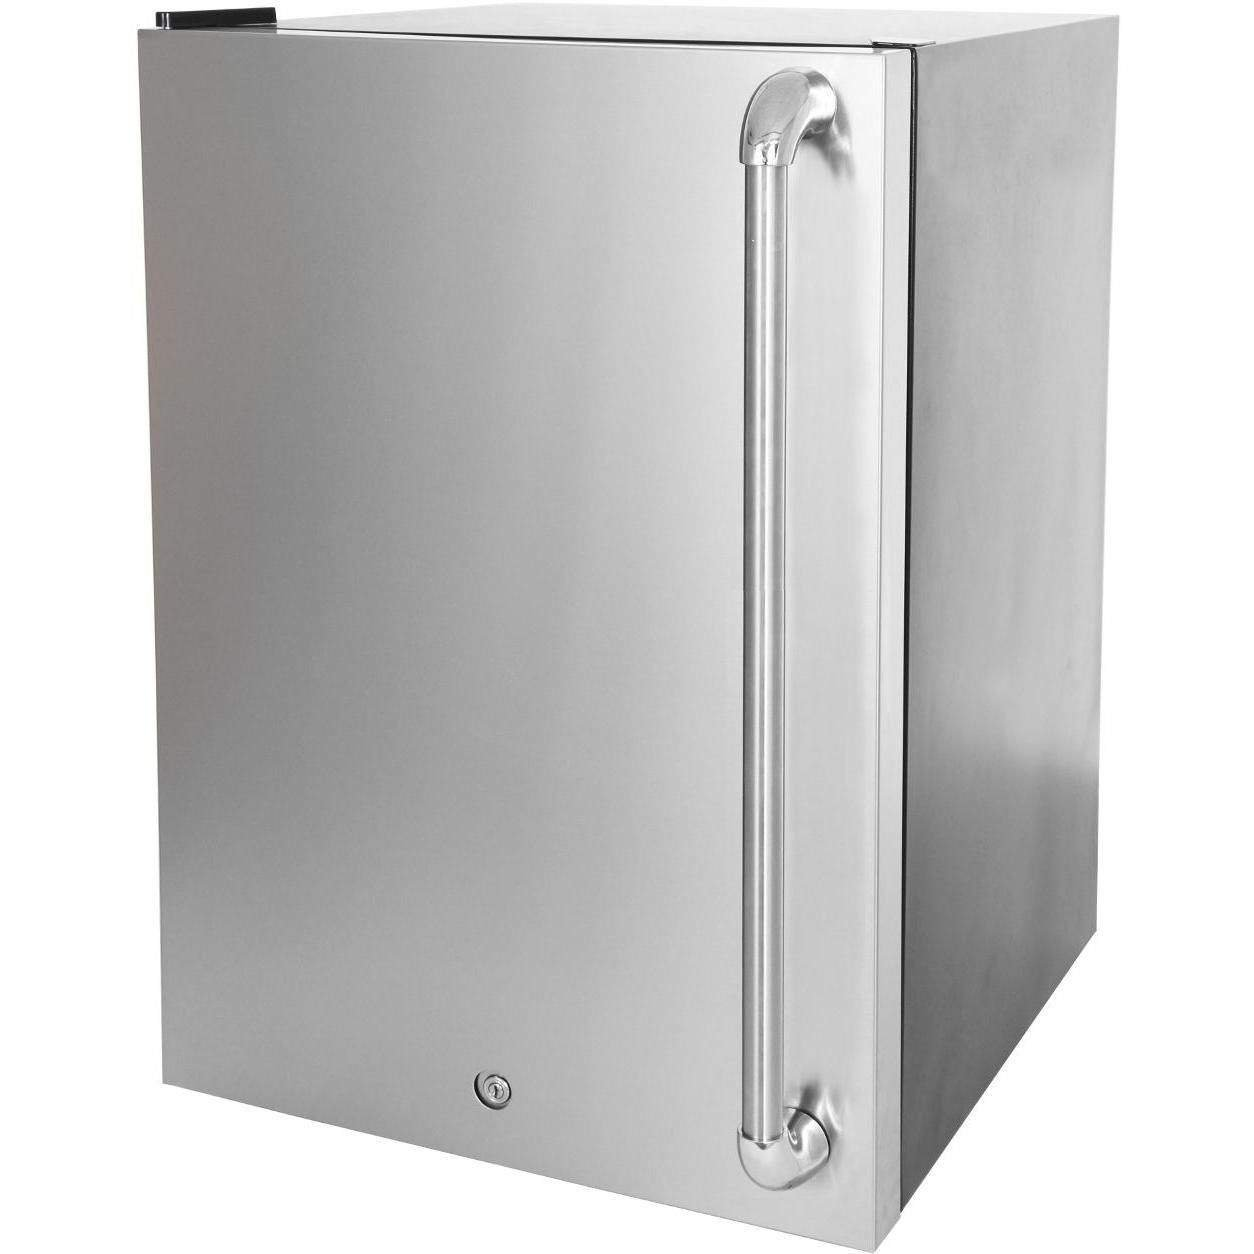 Blaze Stainless Front Door Upgrade 4.5 for Left Hinge (BLZ-SSRF130-BLZ-SSFP-4-5LH) by Blaze